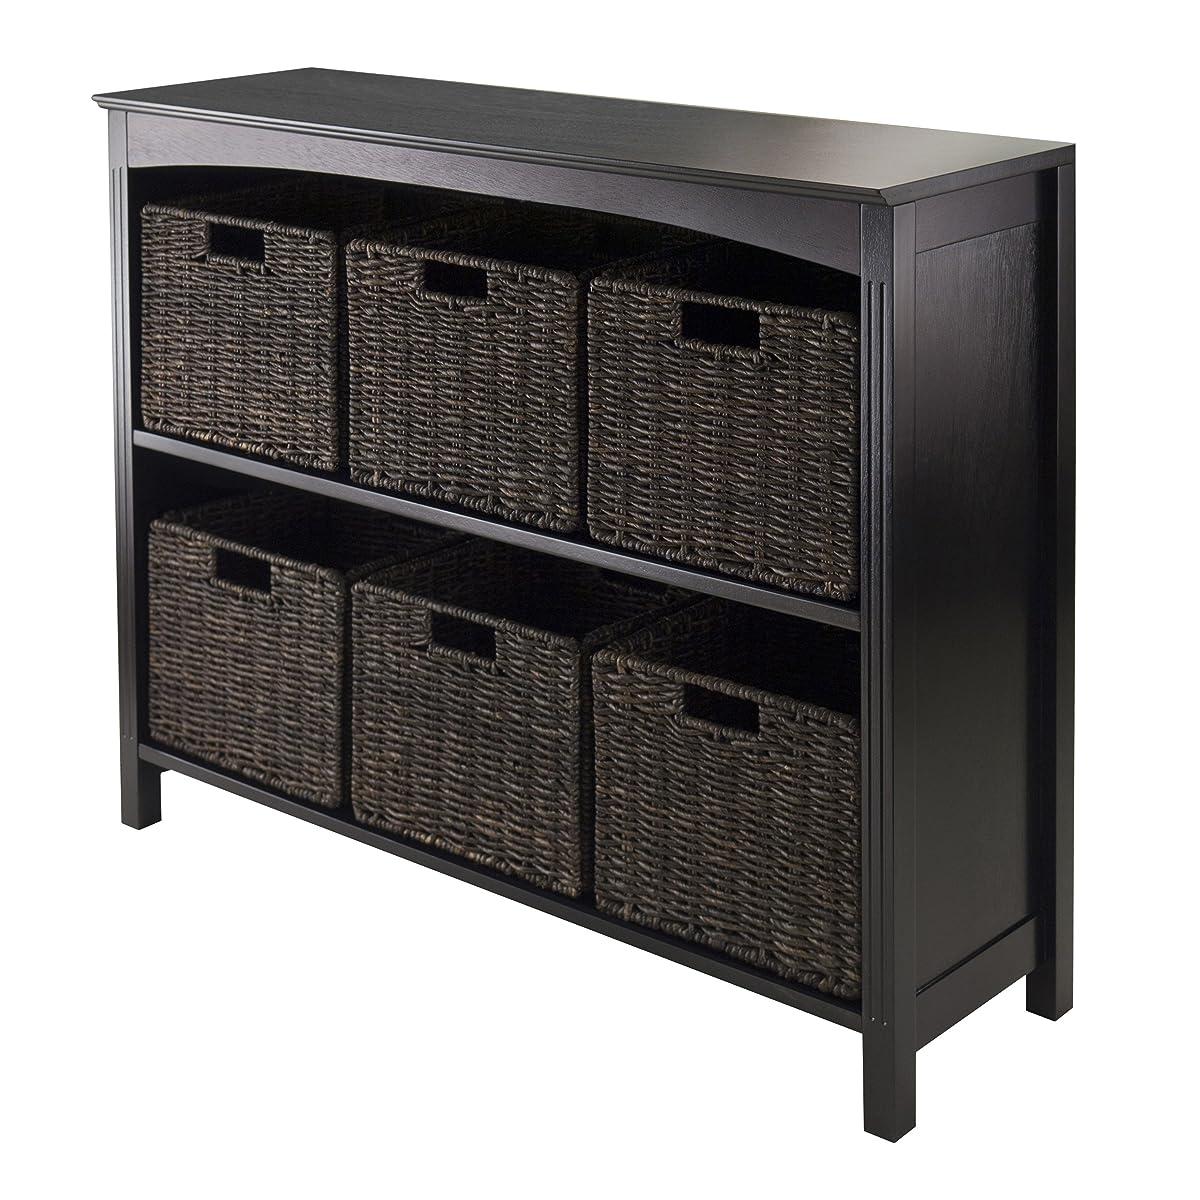 Winsome Terrace 7-Piece Storage Shelf/Bookcase, 37 by 11.8 by 30-Inch